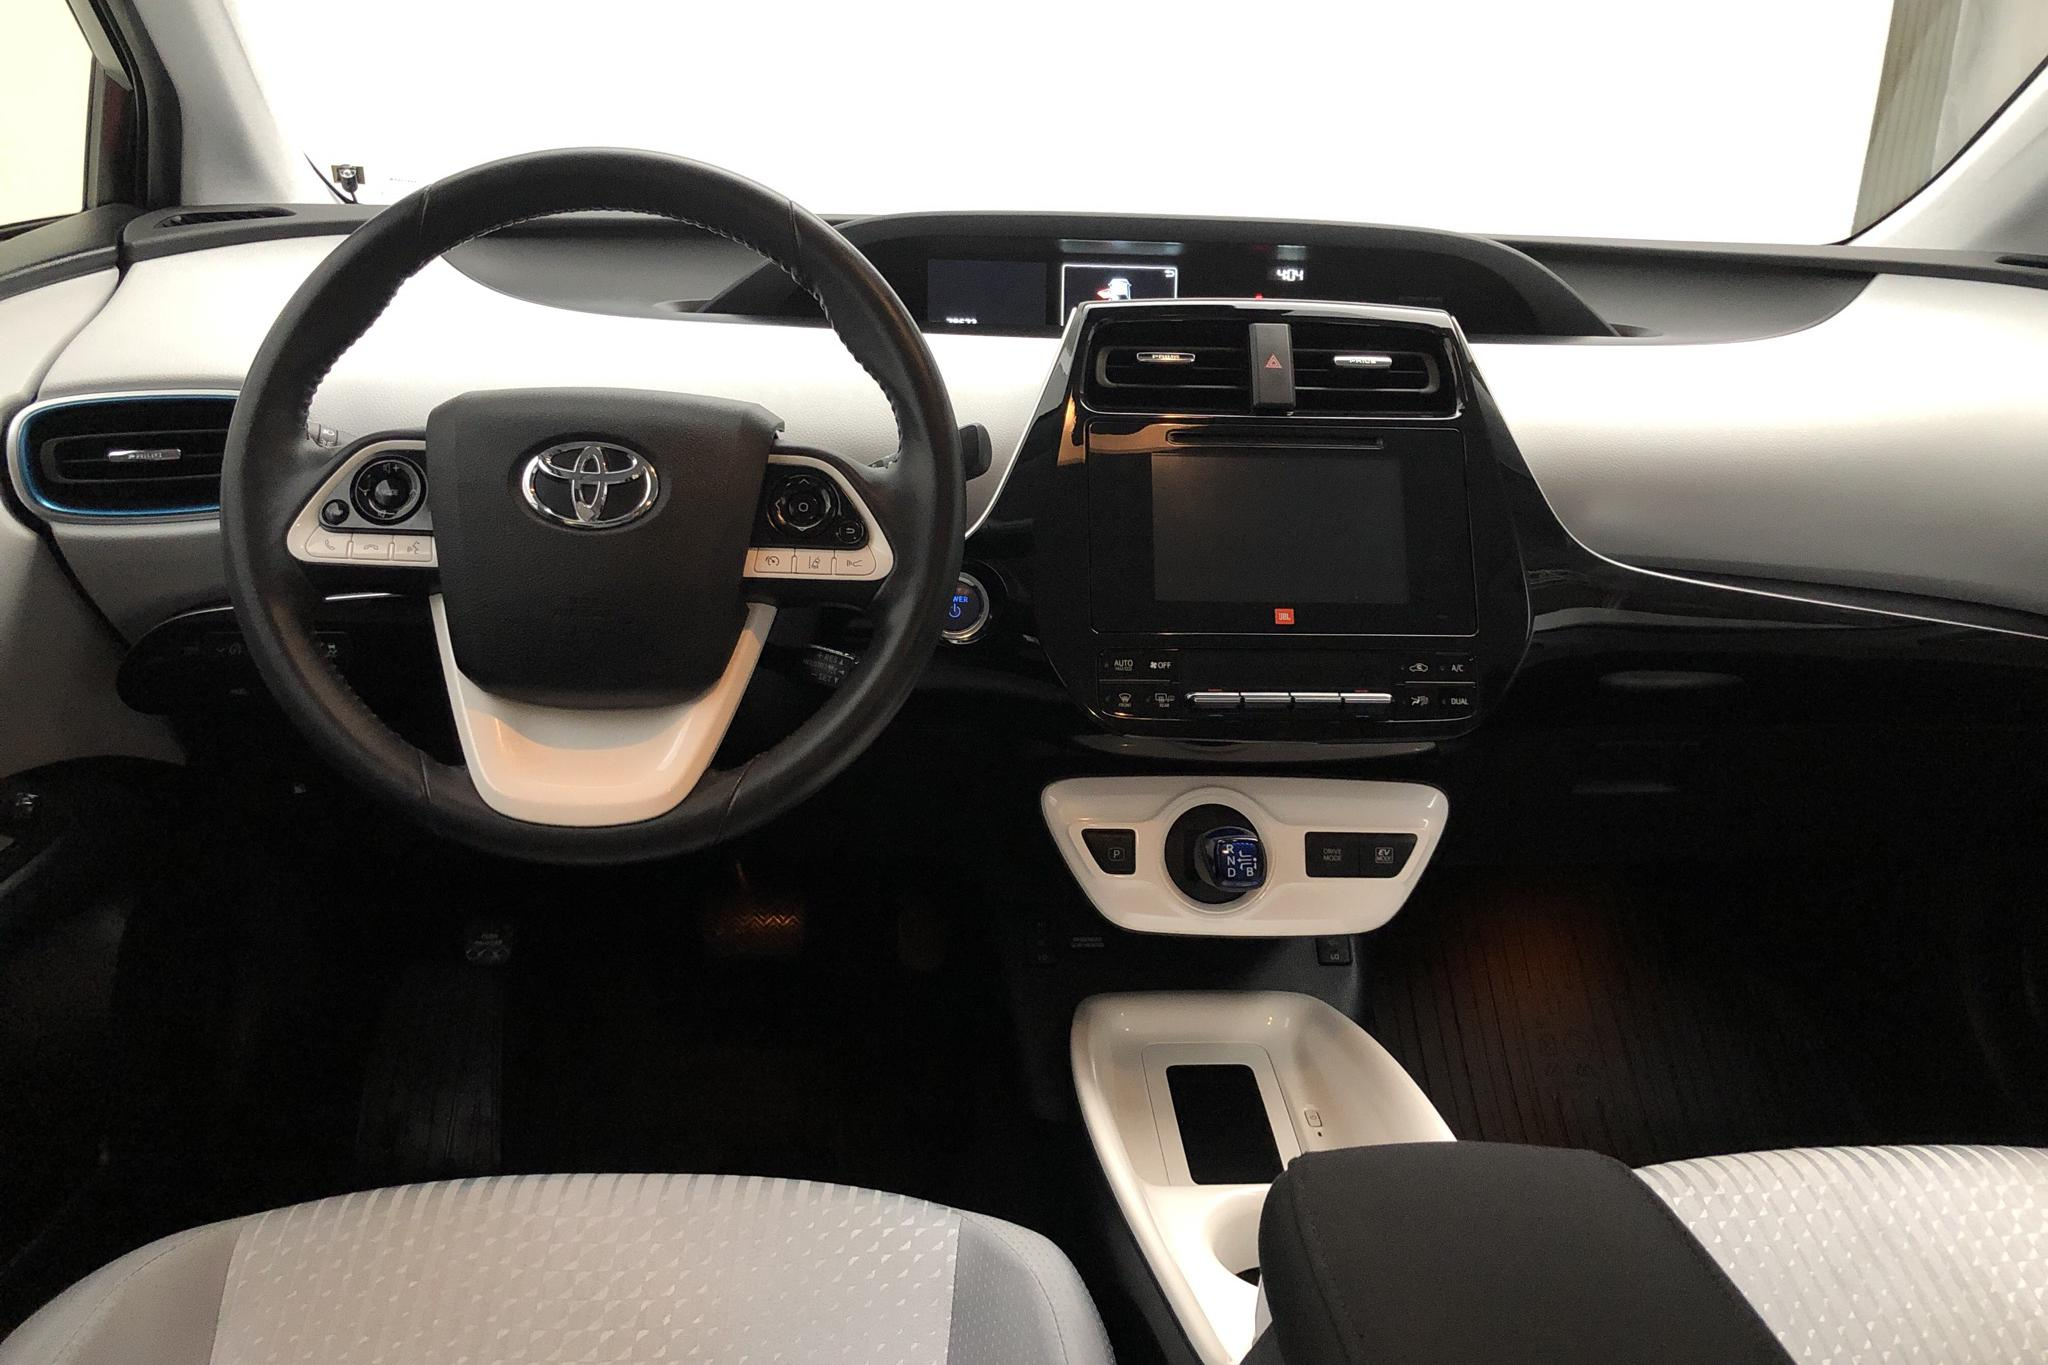 Toyota Prius 1.8 HSD (99hk) - 7 867 mil - Automat - röd - 2016